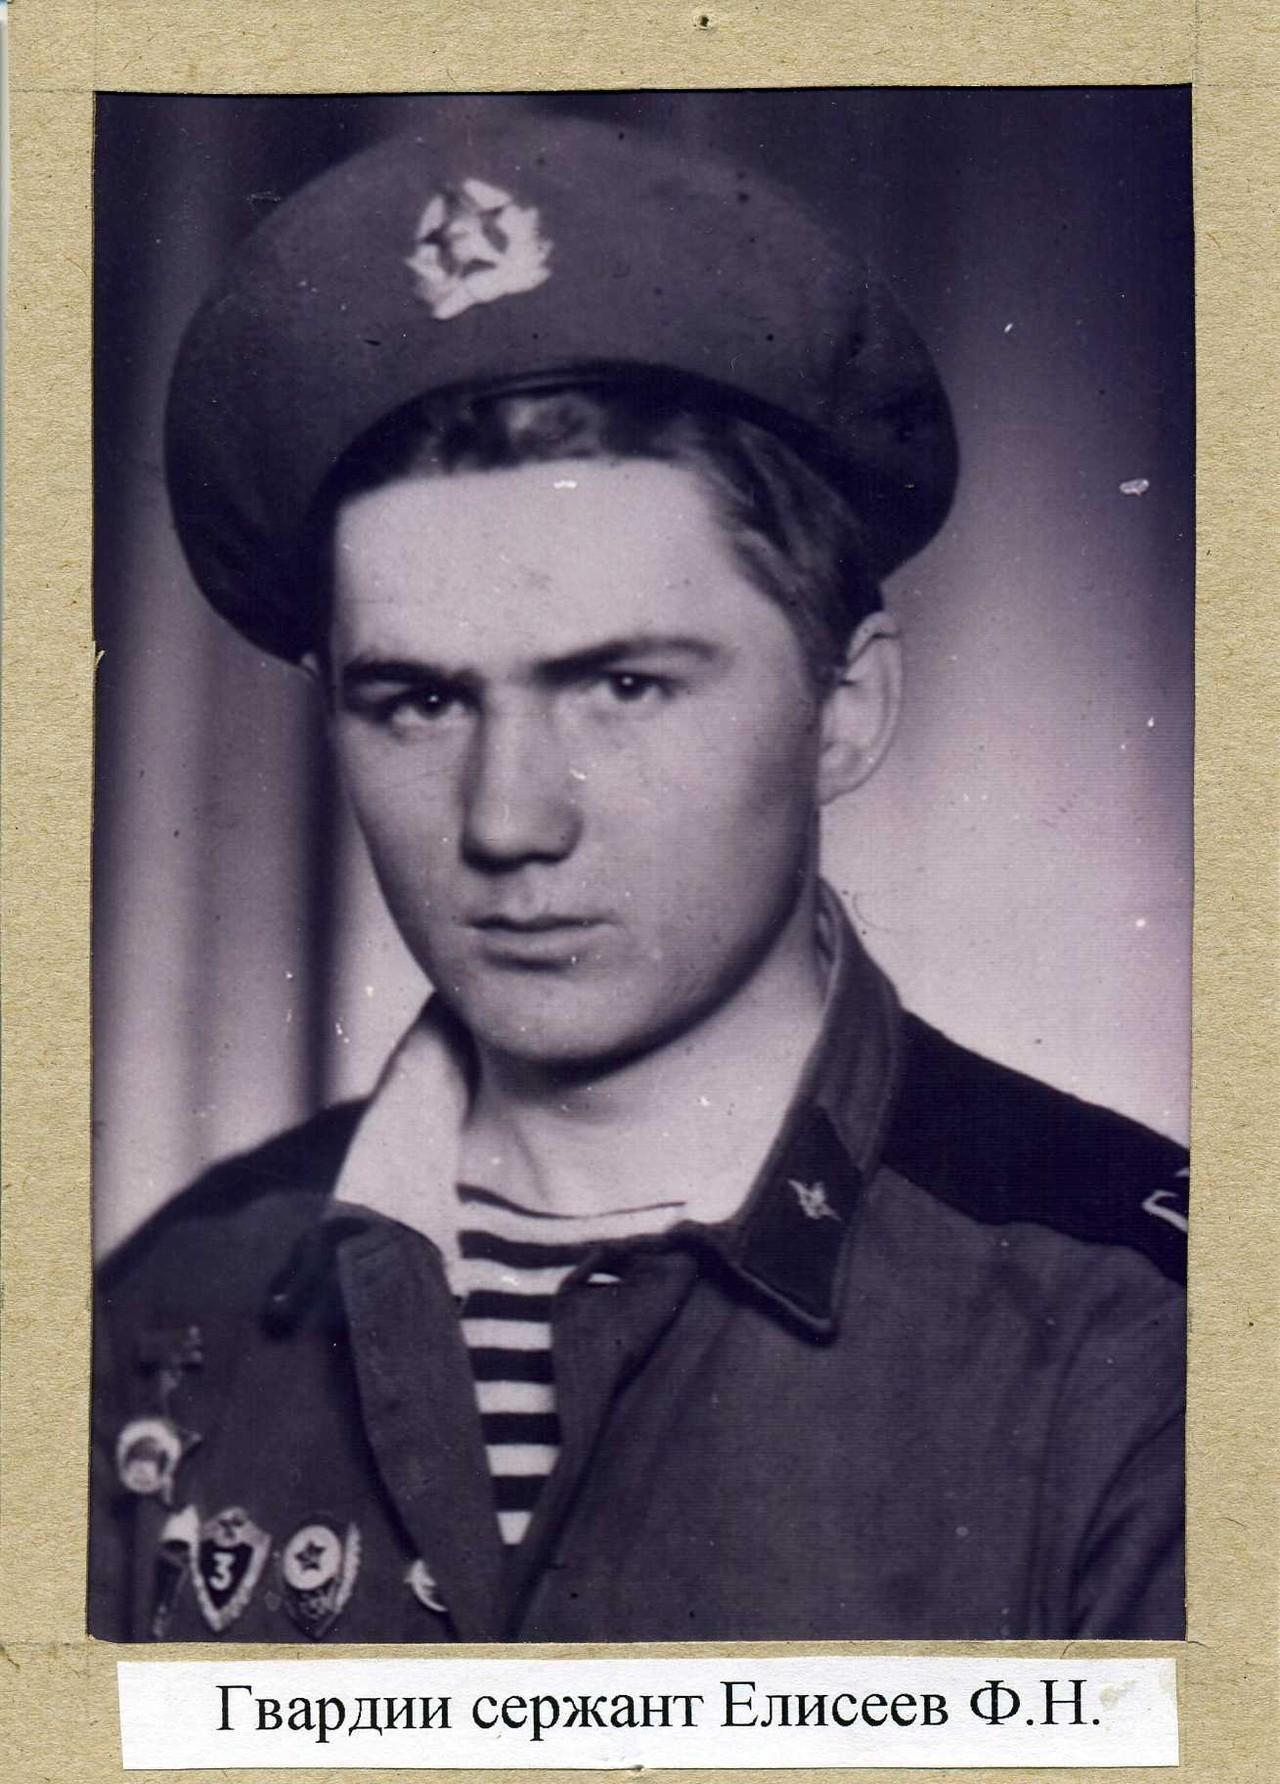 Елисеев Федор Николаевич